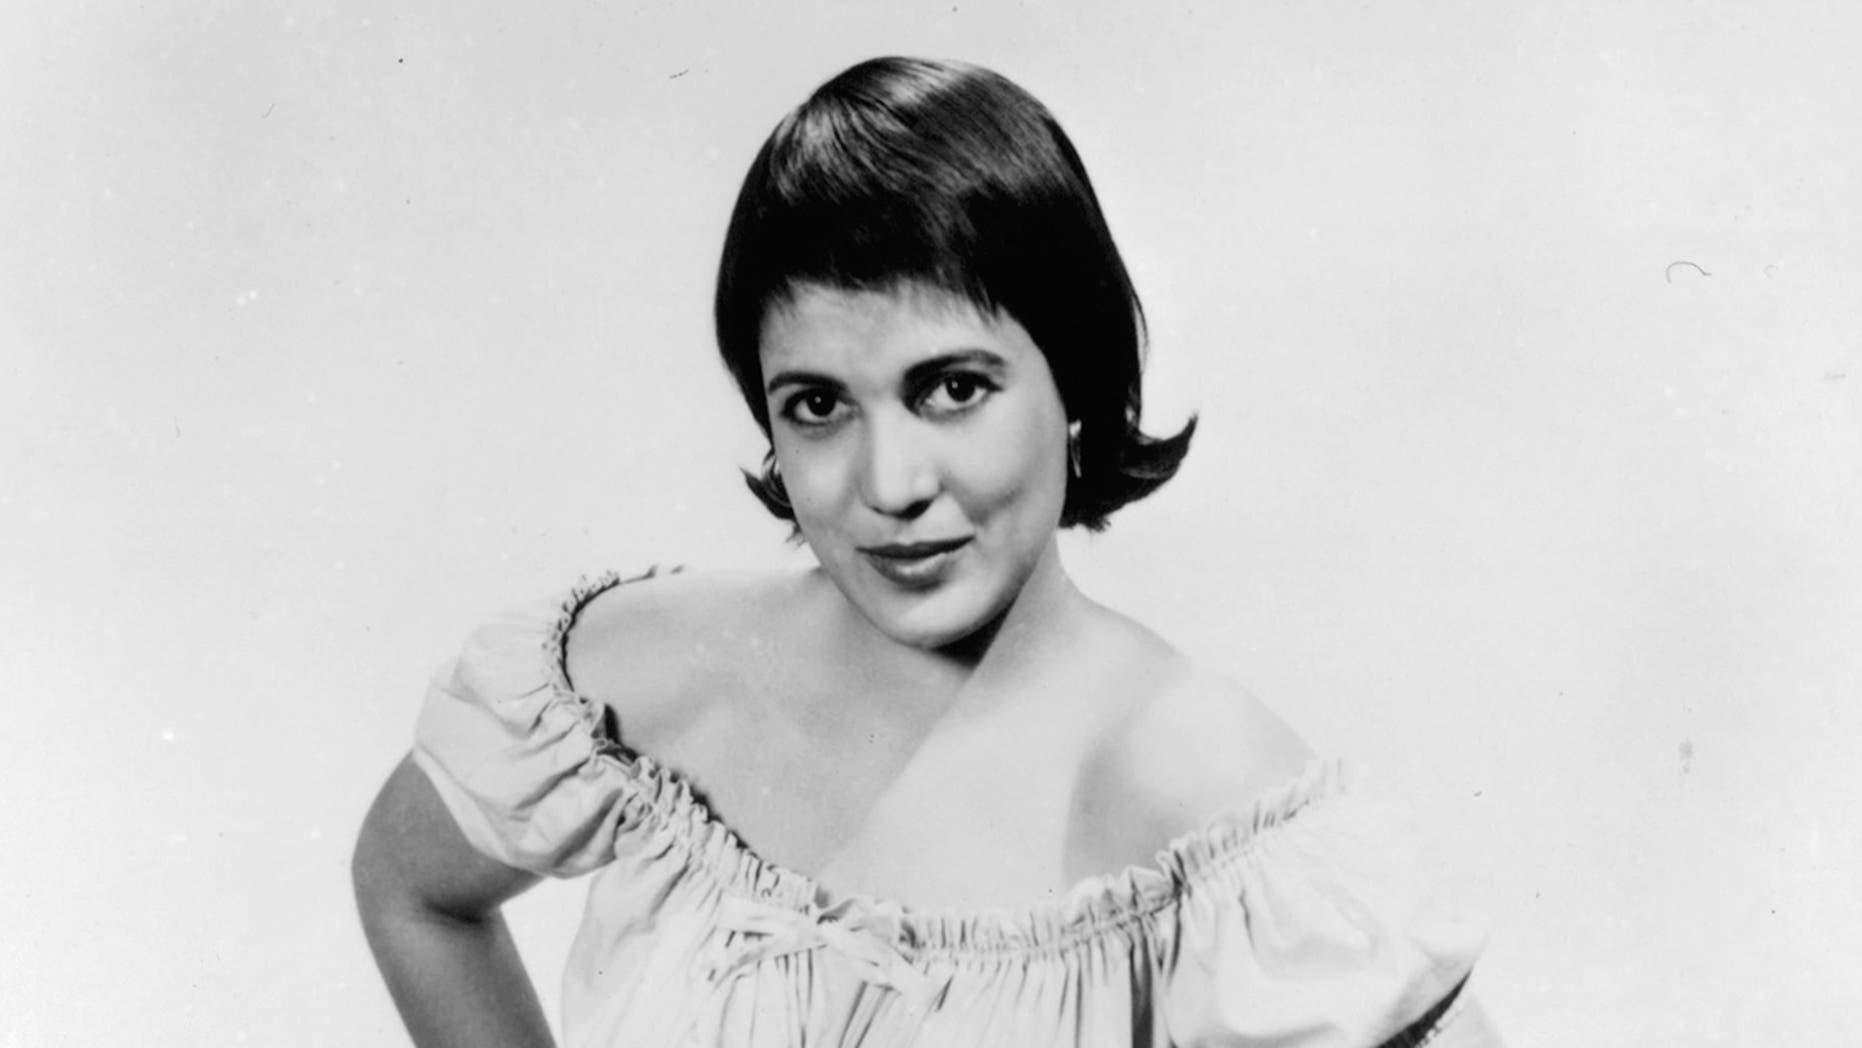 Actress Roberta Haynes poses for a portrait in circa 1956.